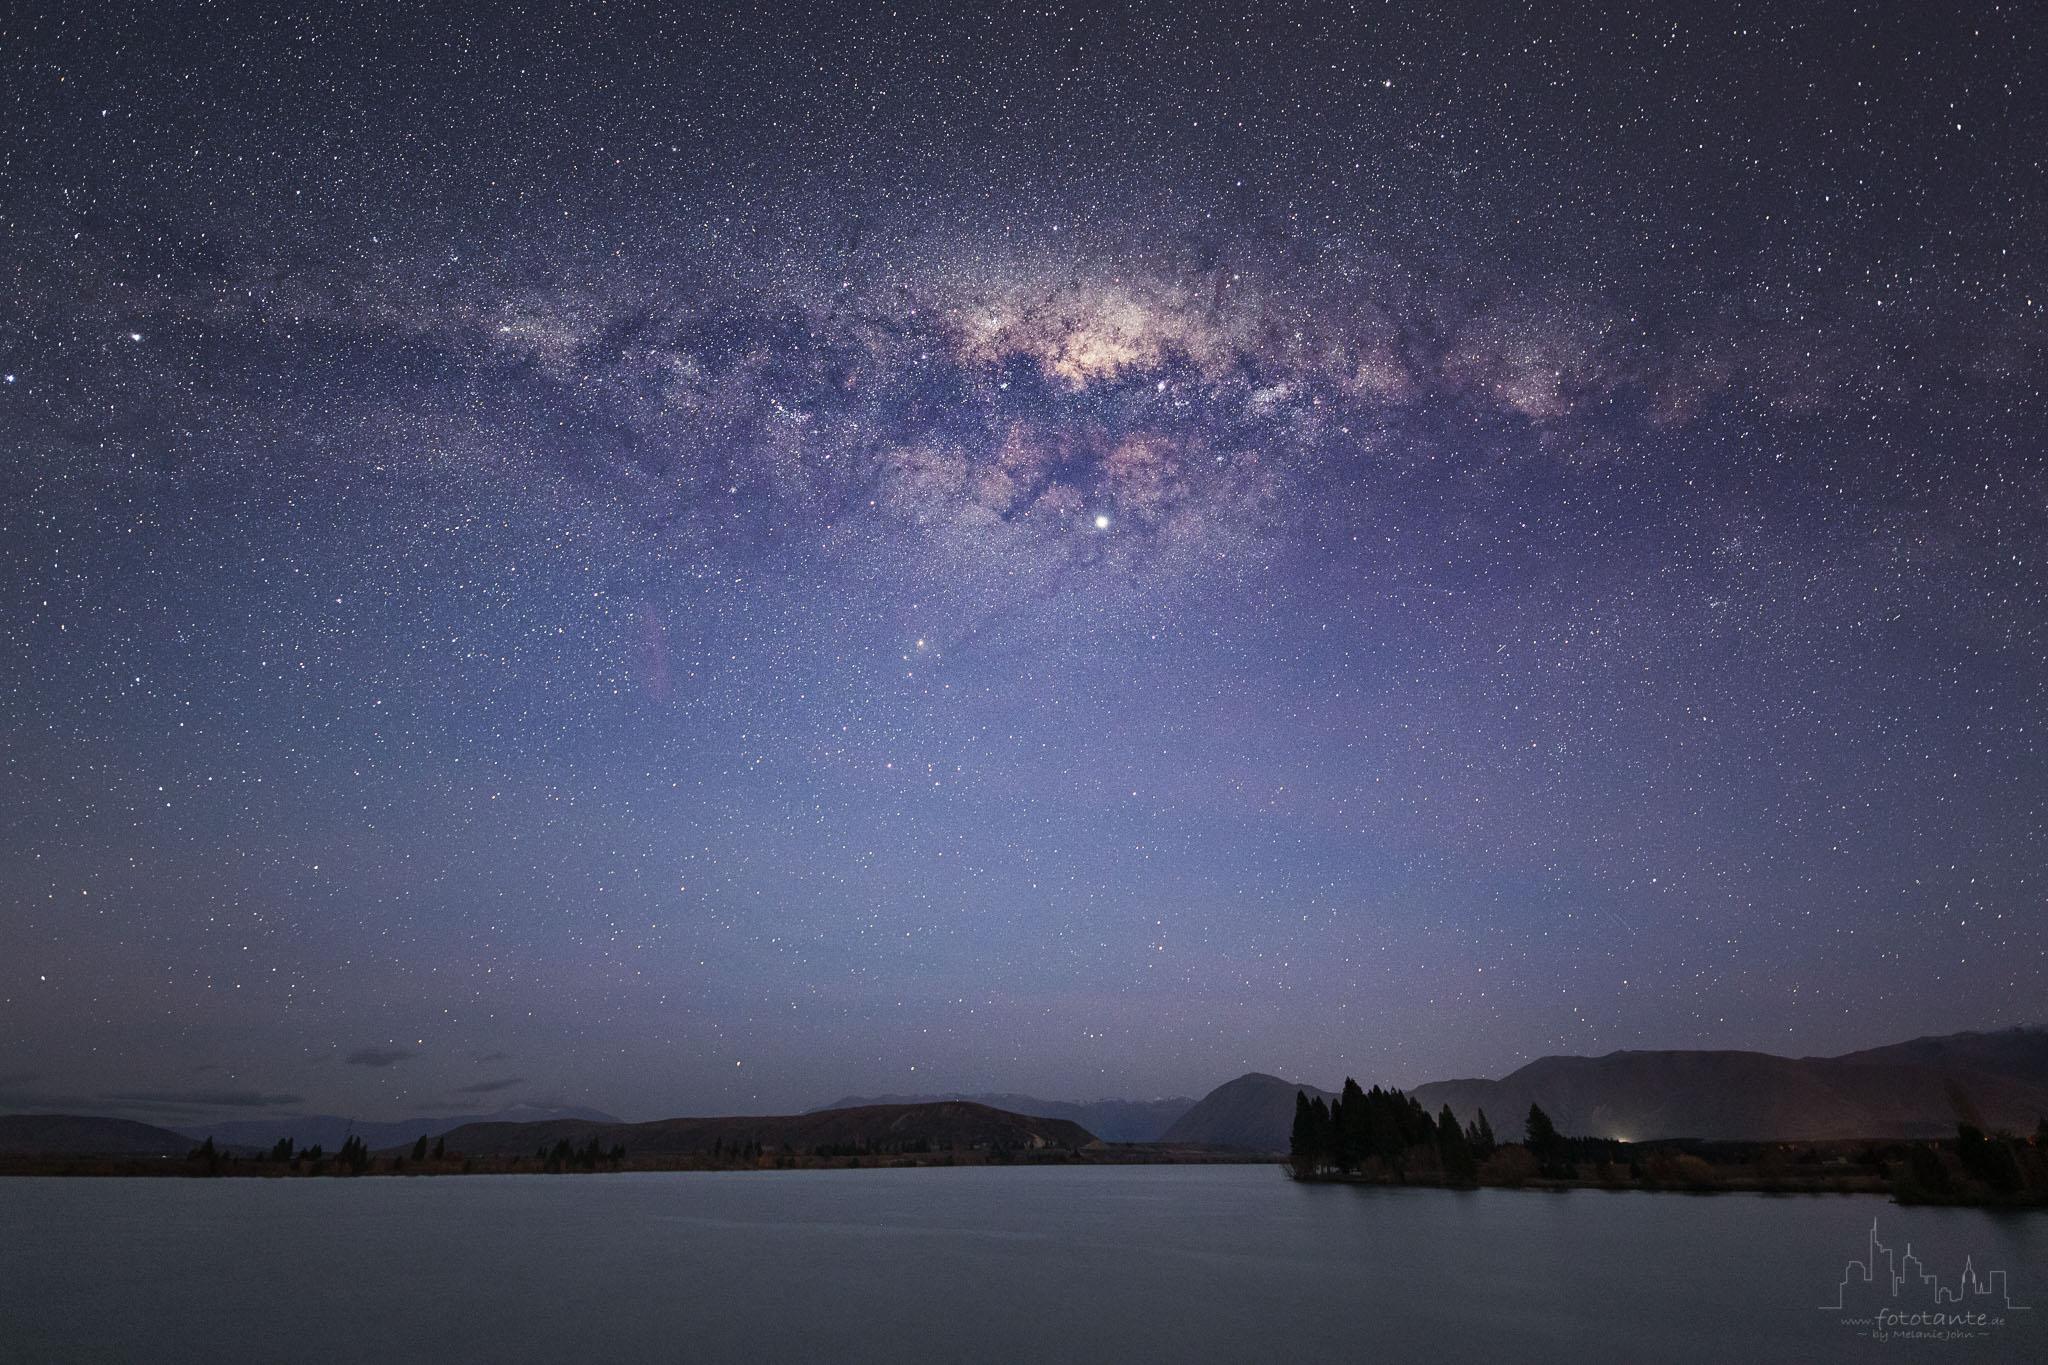 Milky way at Lake Ruataniwha, Ben Ohau, NZ, New Zealand